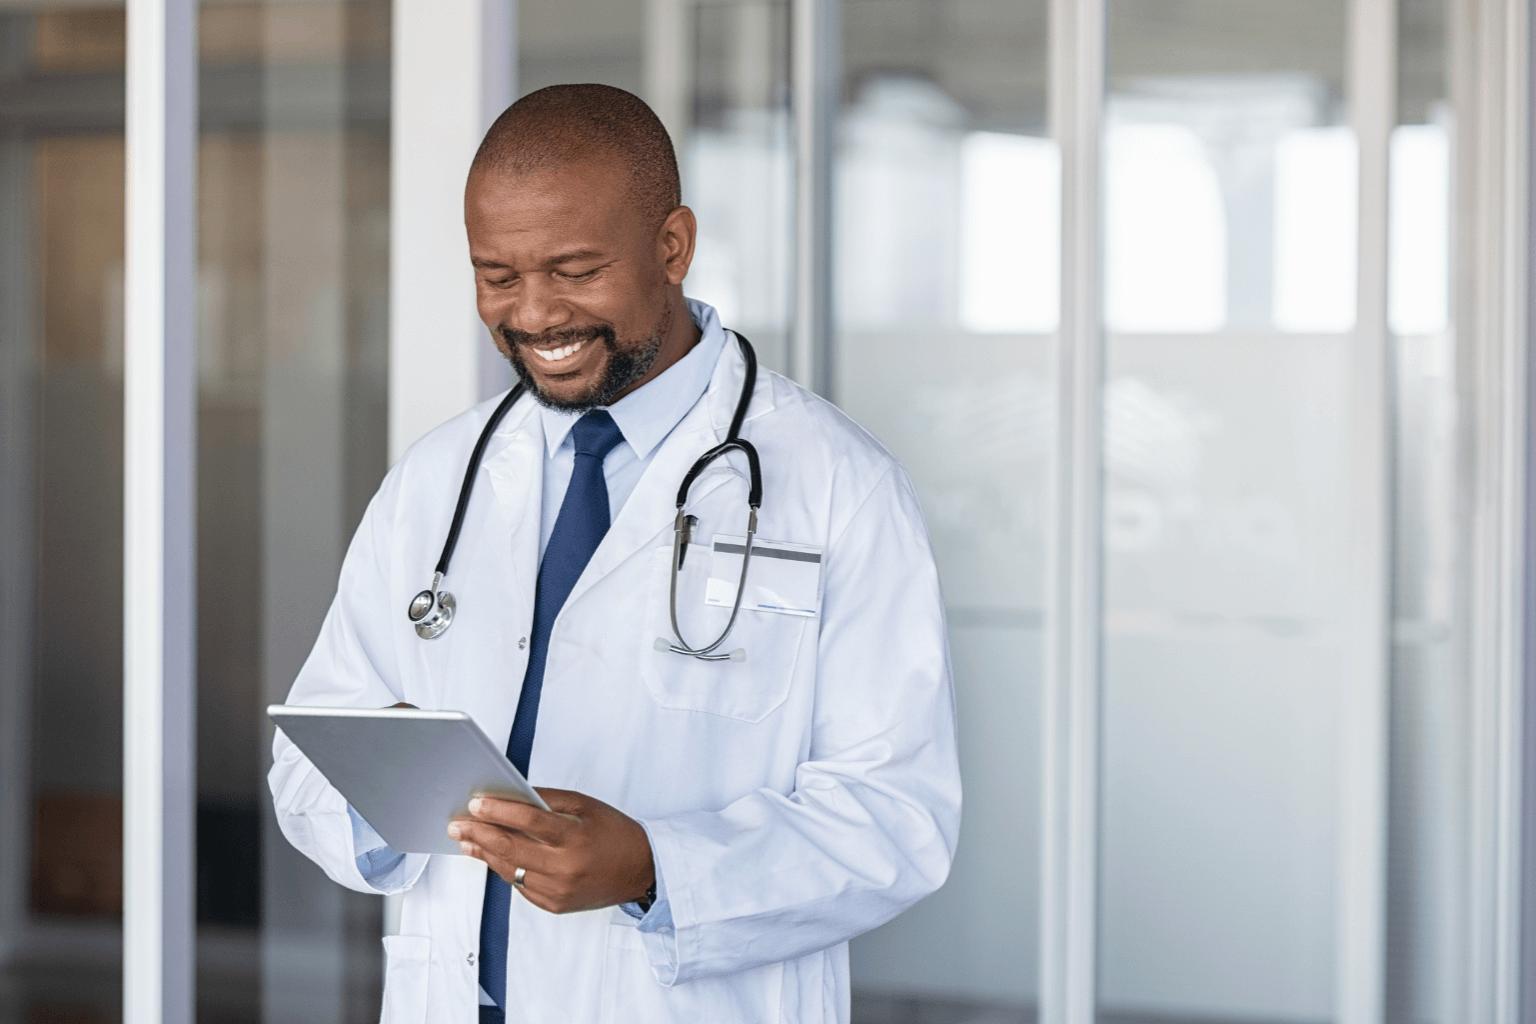 doctor-using-digital-tablet-in-corridor-of-modern-hospital-jpg